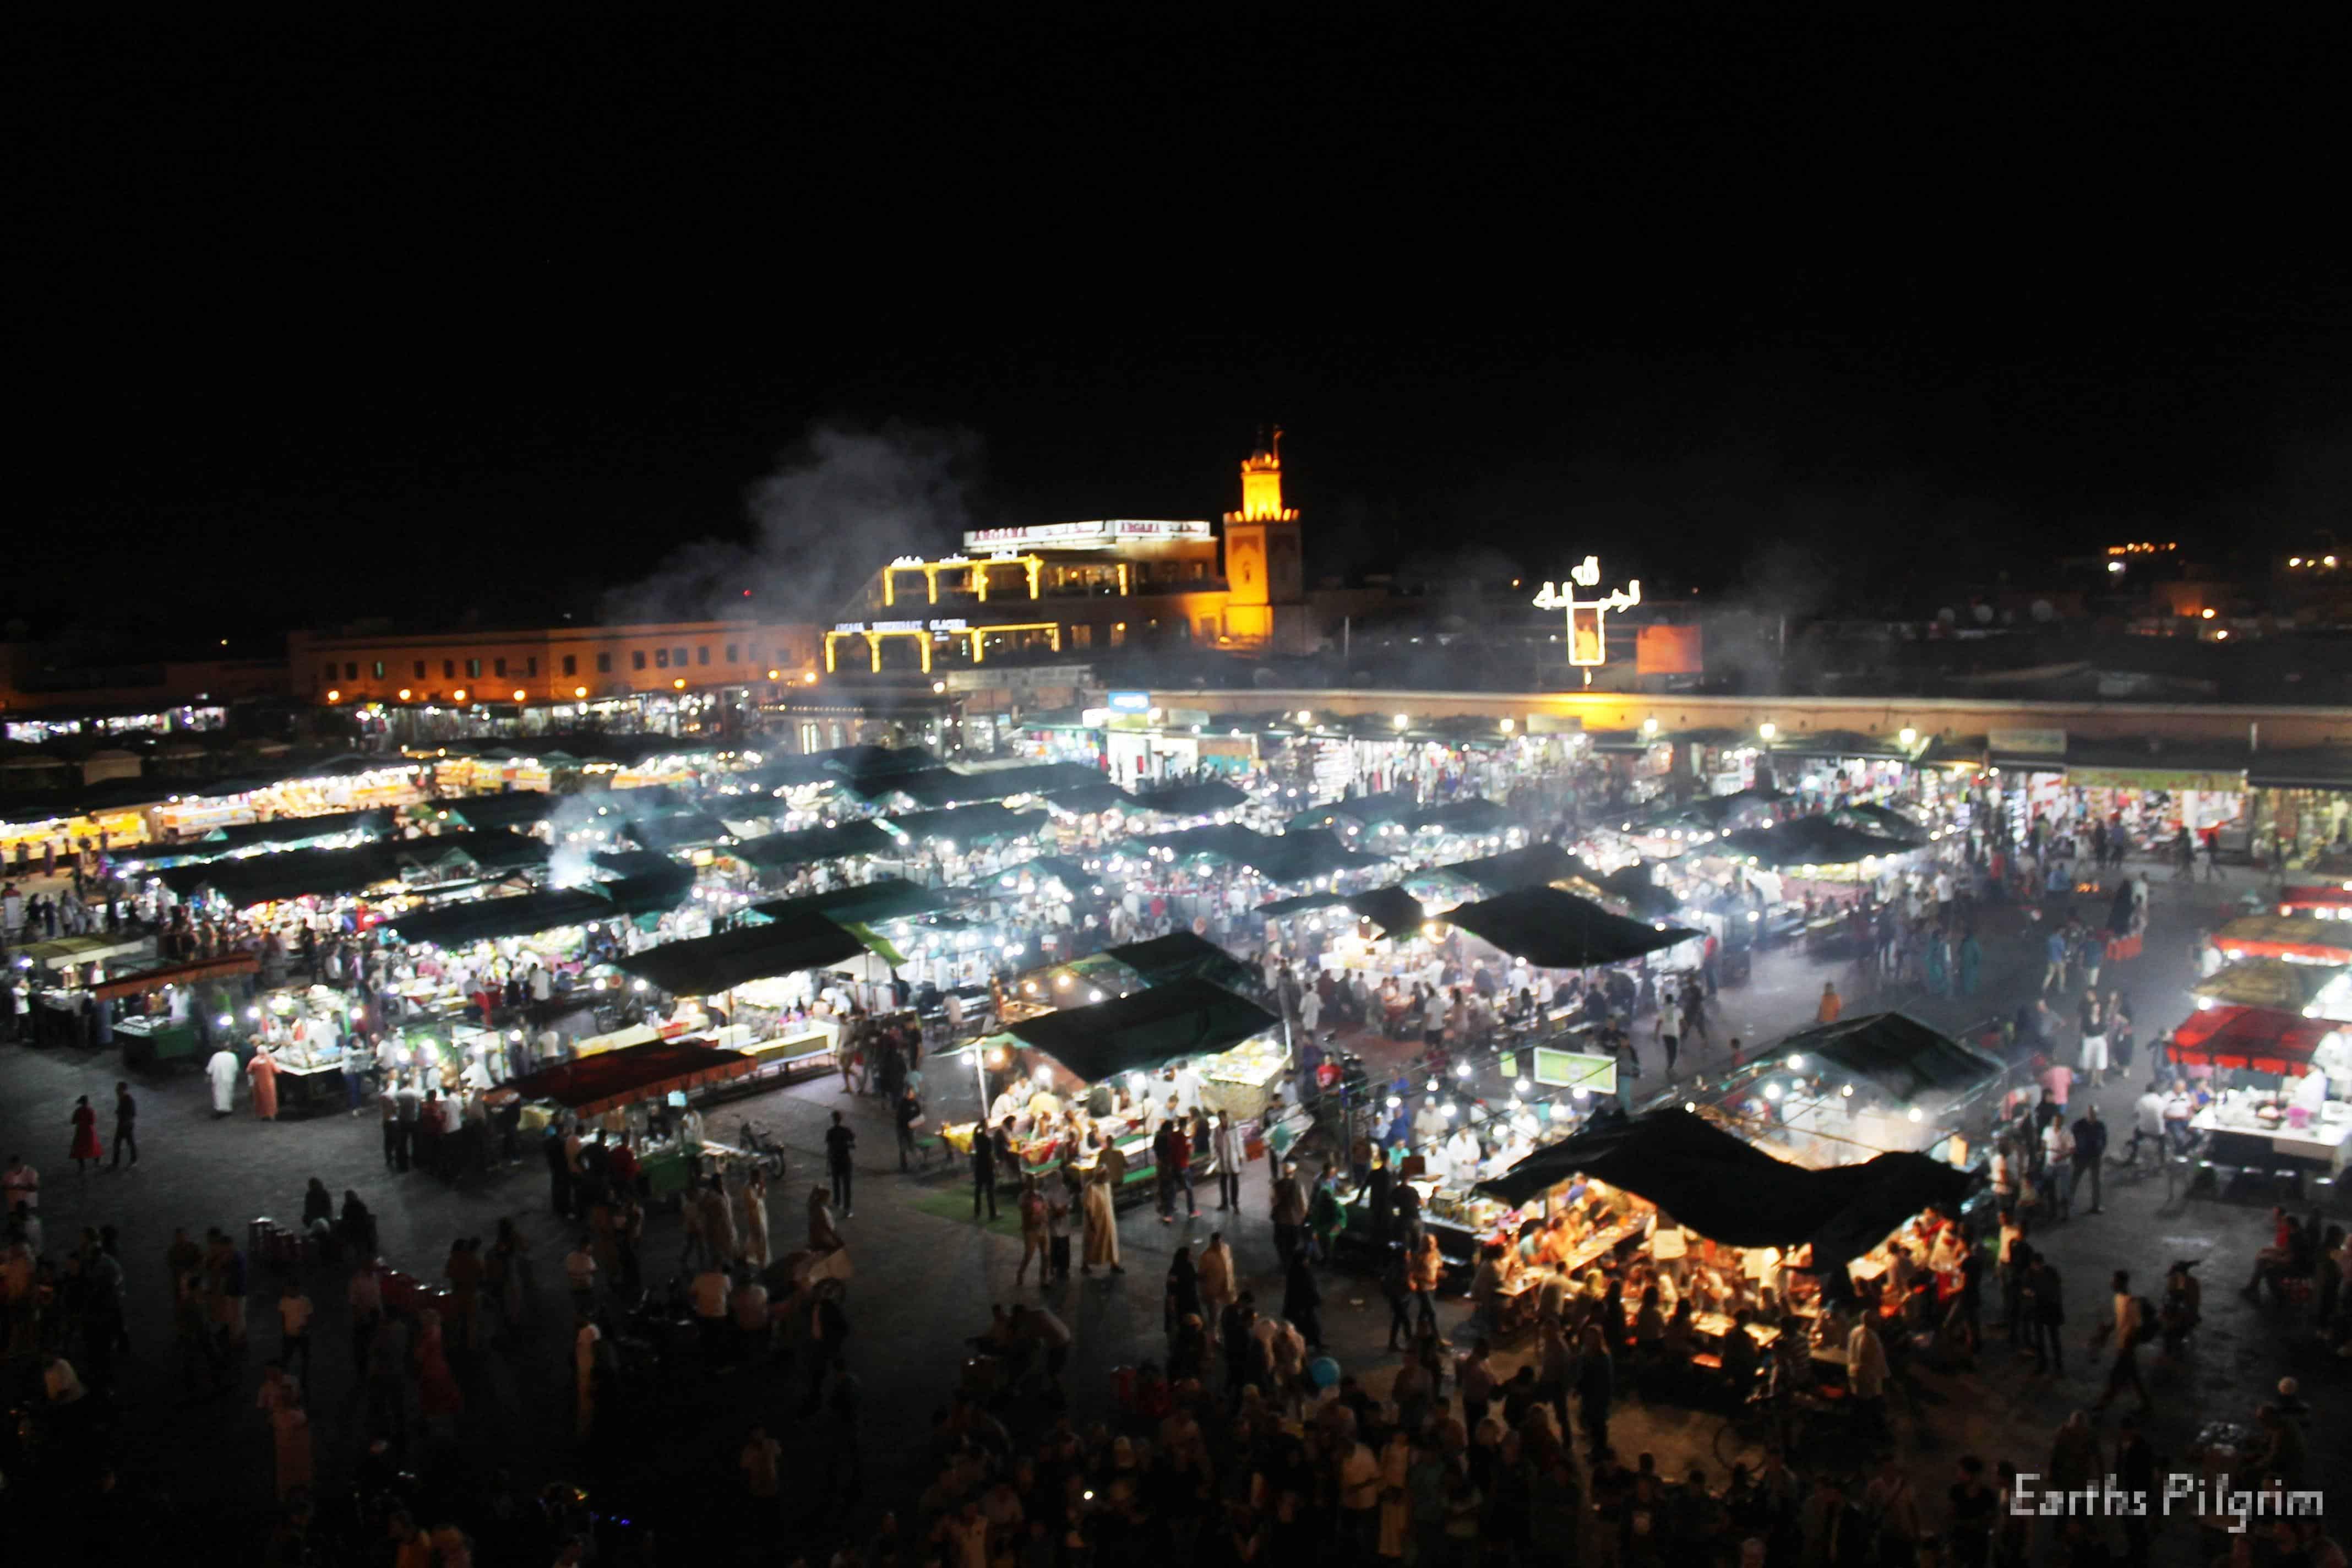 Marrakech Medina: Navigating the Chaos